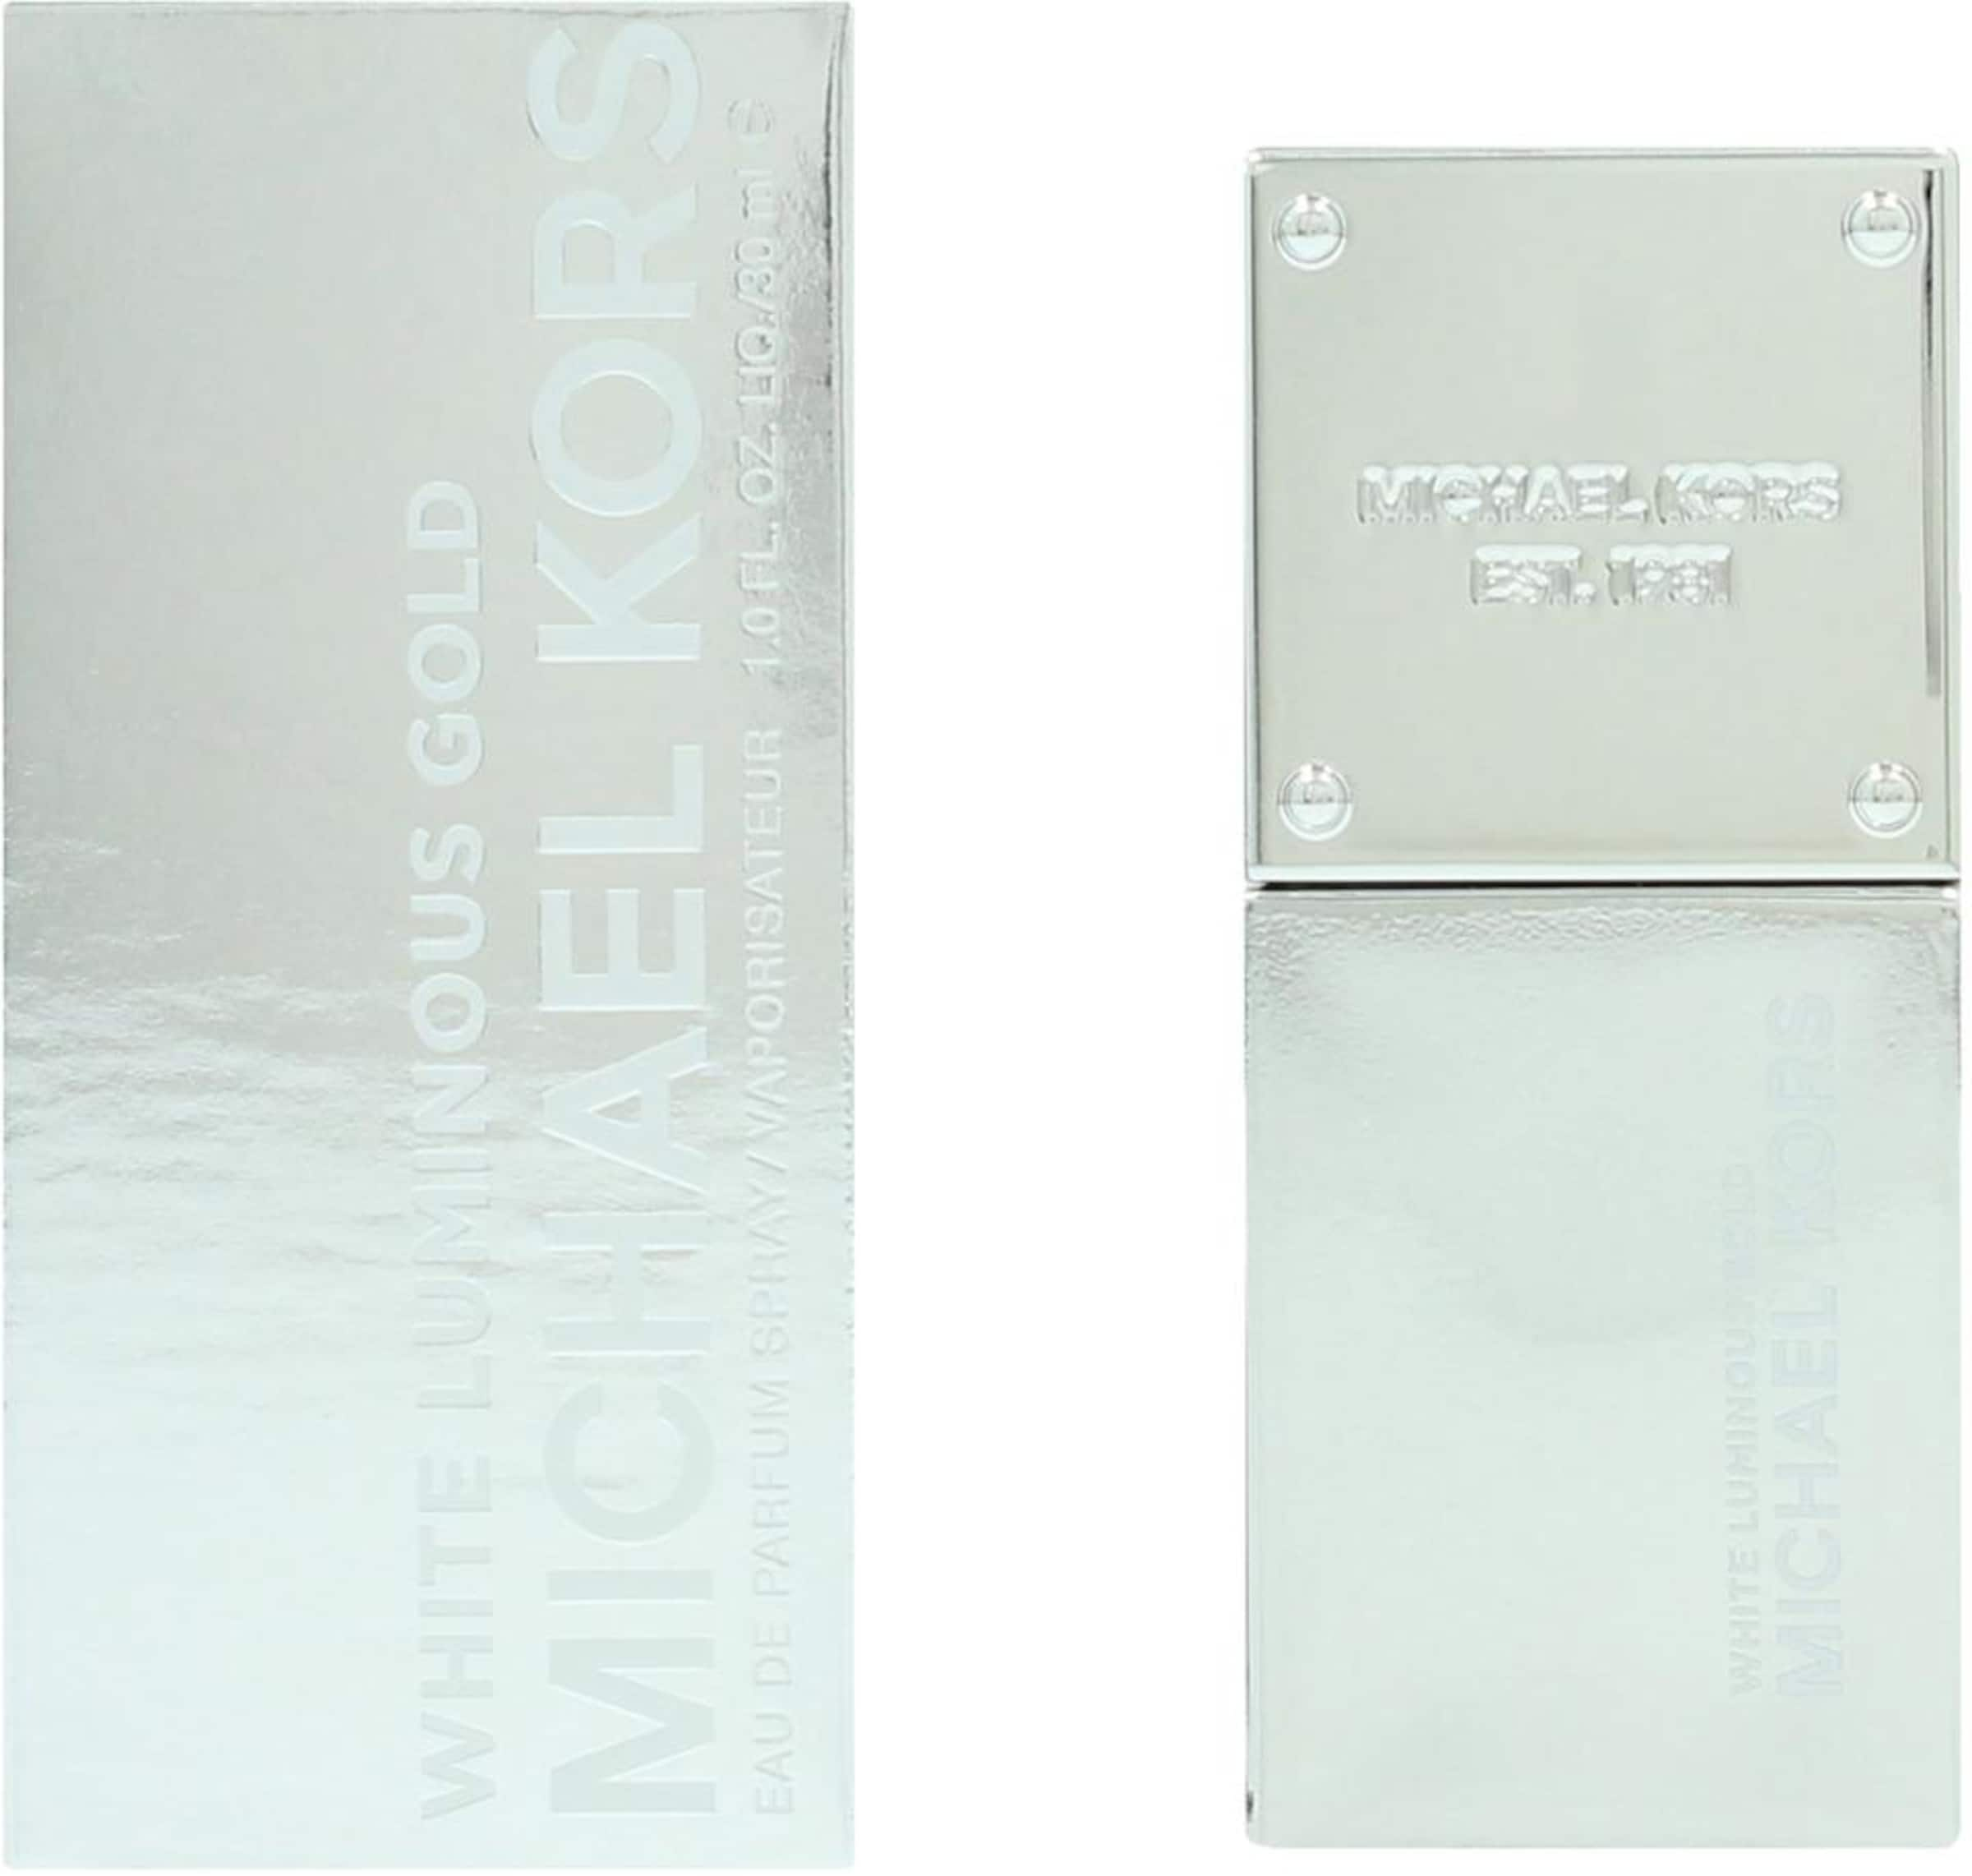 Nett Michael Kors 'White Luminous Gold' Eau de Parfum Brandneues Unisex Günstiger Preis mxhzPu3N